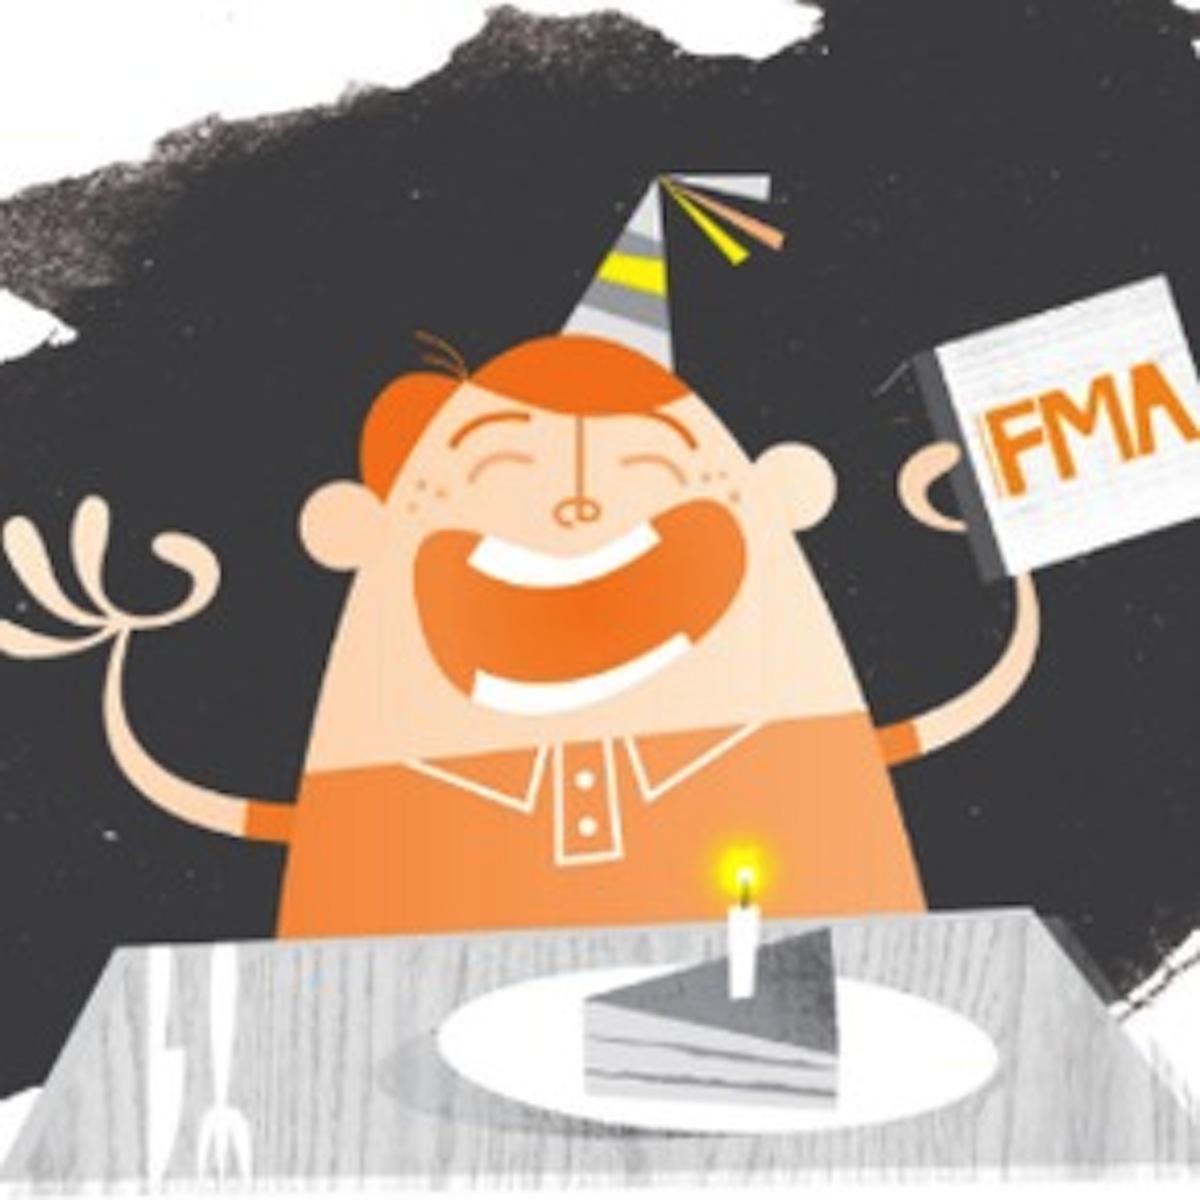 Happy Birthday Matson by Adventurer411 on deviantART |Creative Commons Birthday